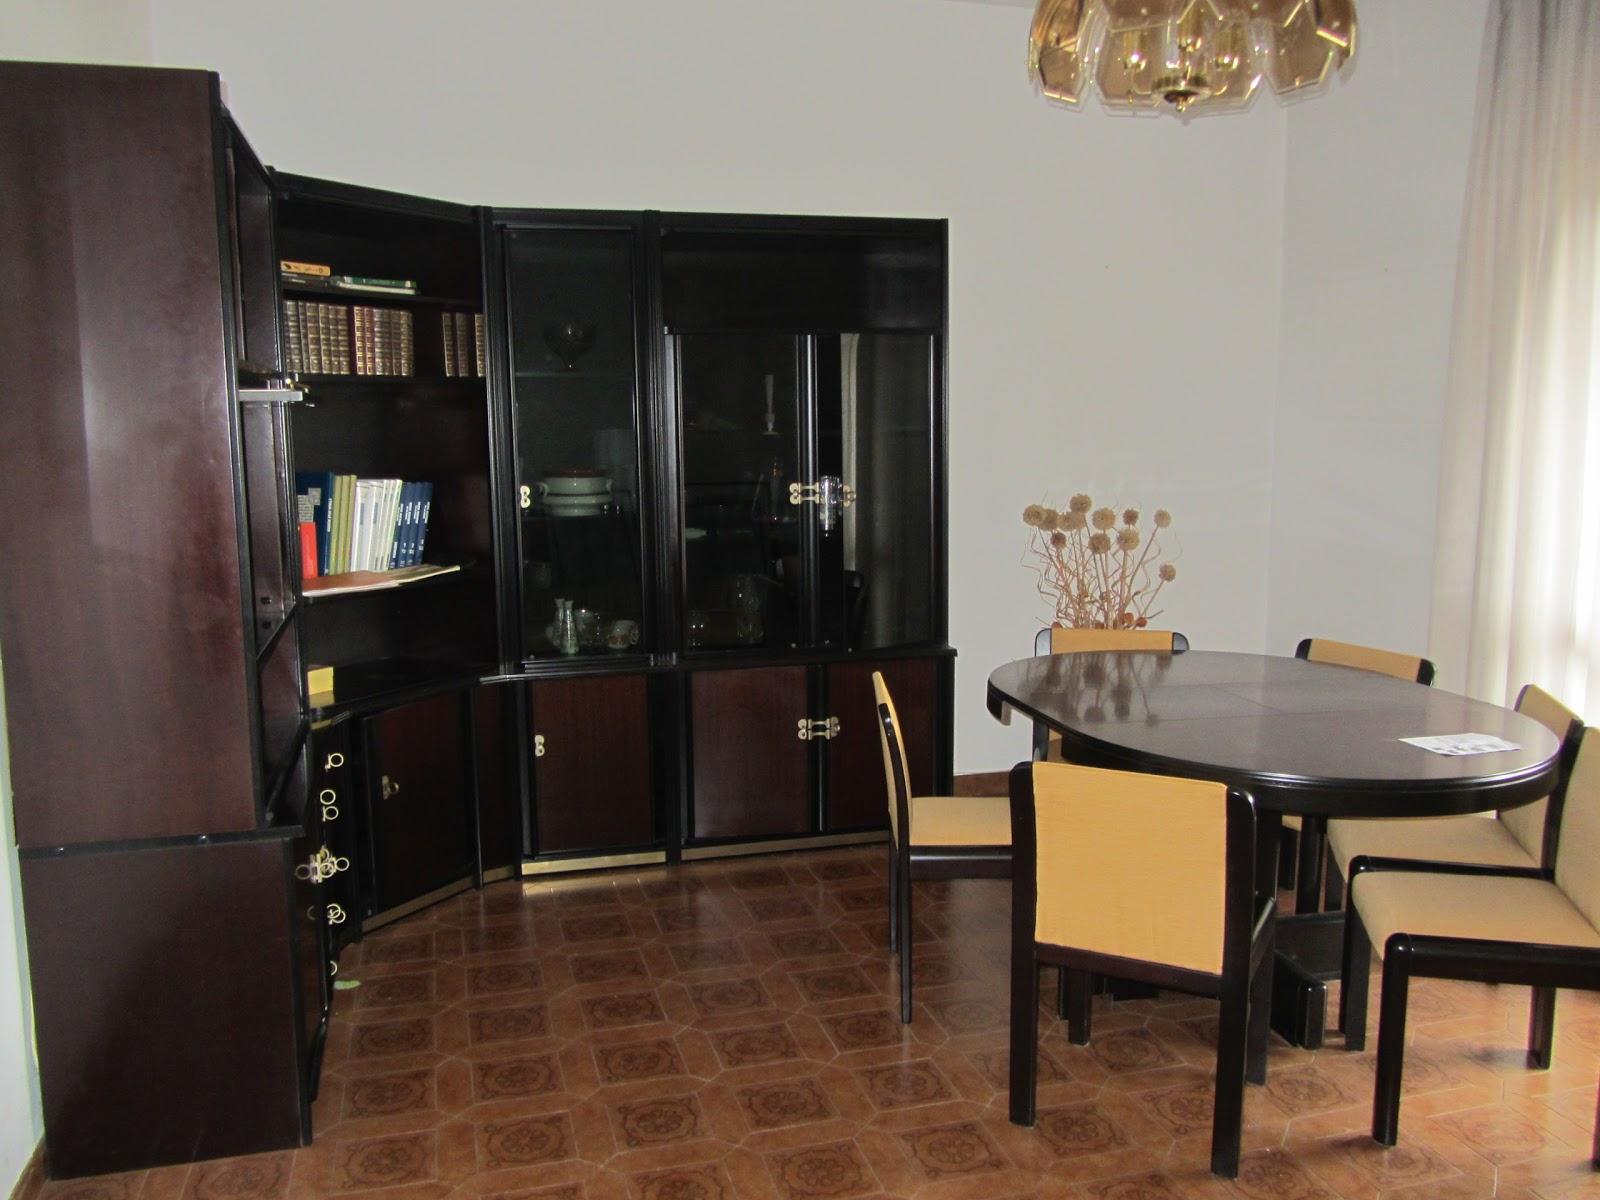 Mobile Sala Da Pranzo.Mobili Sala Da Pranzo Anni 50 Cool Editor Design Street With